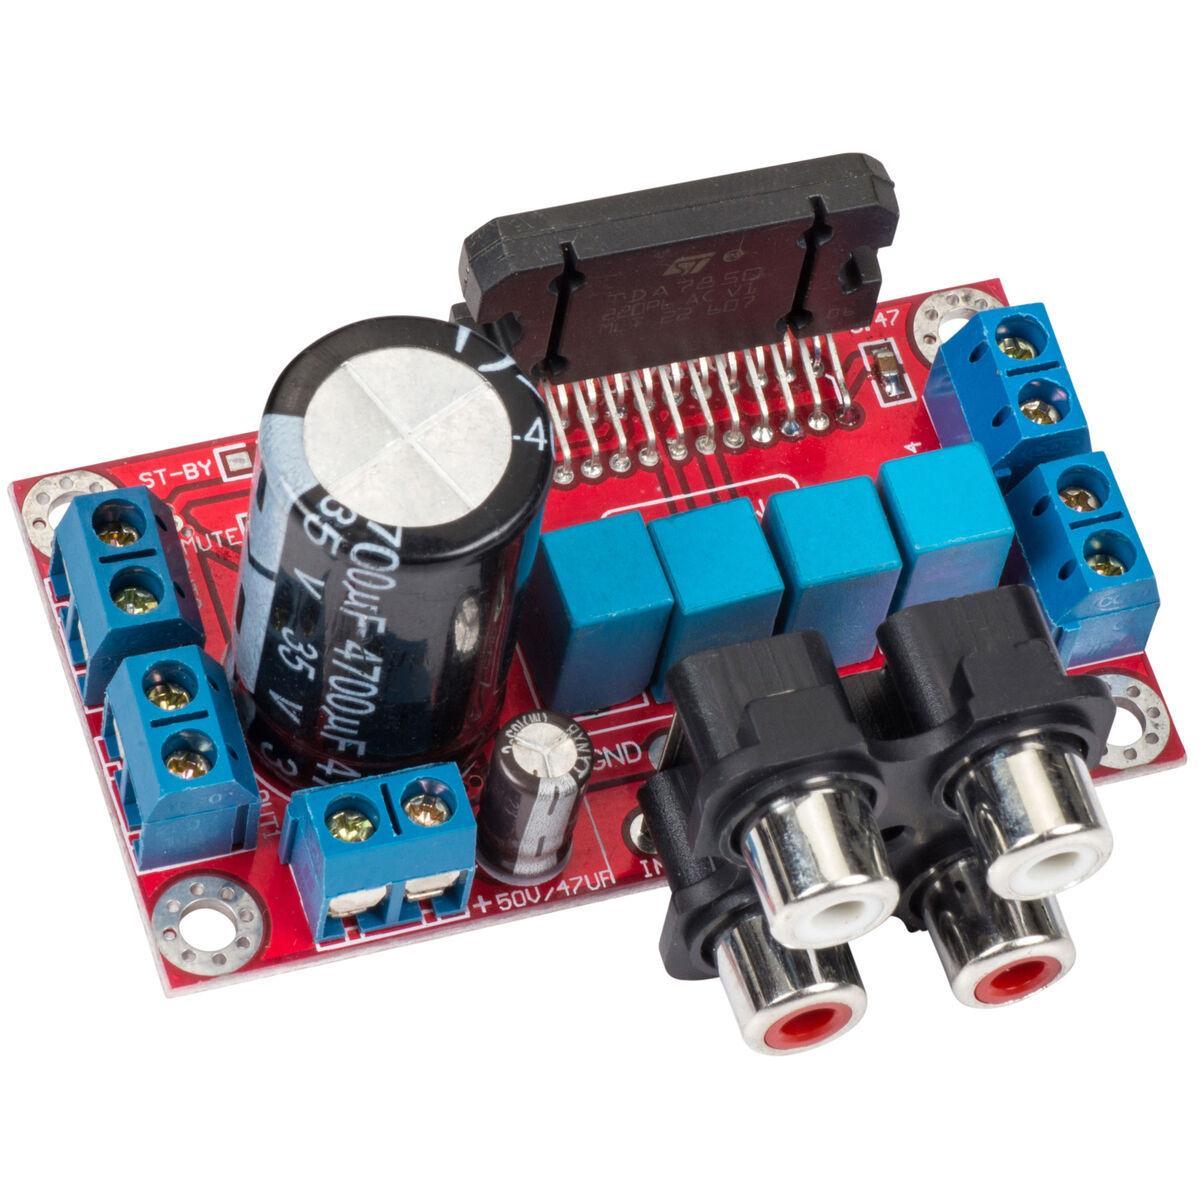 TDA7850 4x50W Bluetooth 5.0 Power Amplifier Audio Class AB HiFi Stereo Amplifier